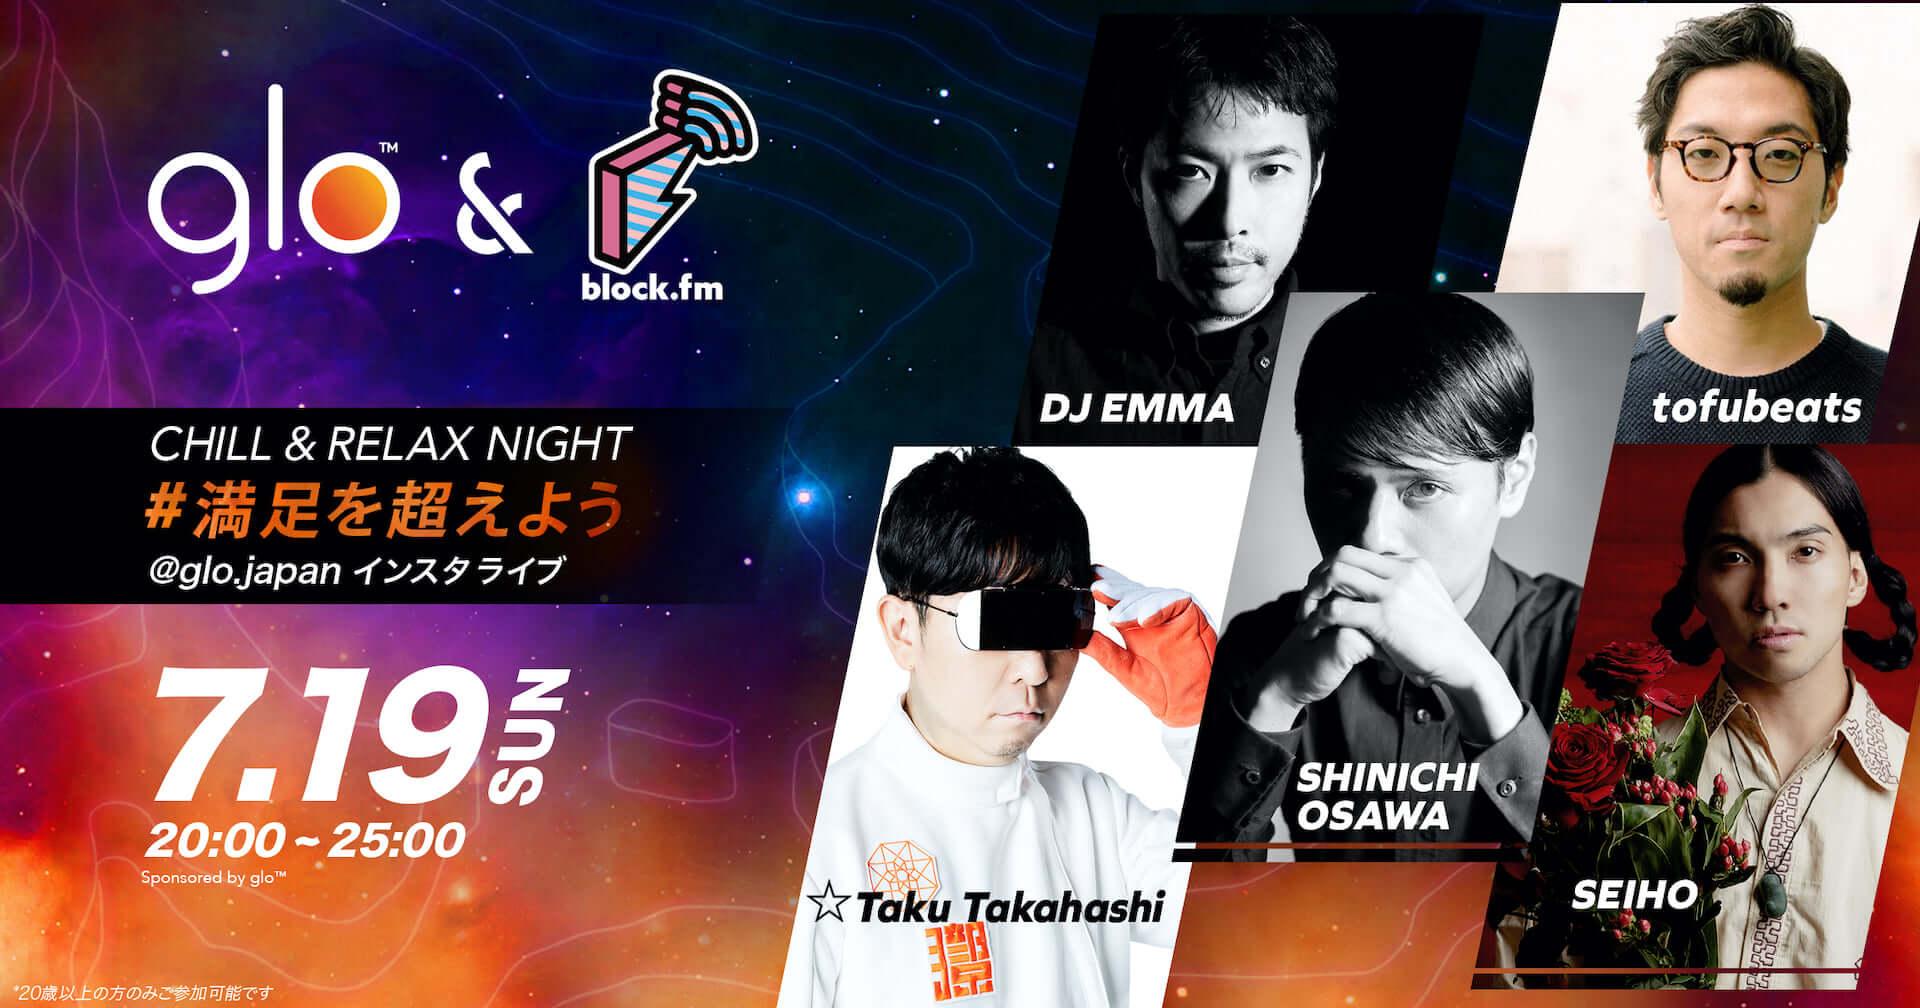 glo™とblock.fmによる配信企画にSeiho、SHINICHI OSAWA、tofubeats、☆Taku Takahashi、DJ EMMAが出演決定! music200713_glo-blockfm_1-1920x1008